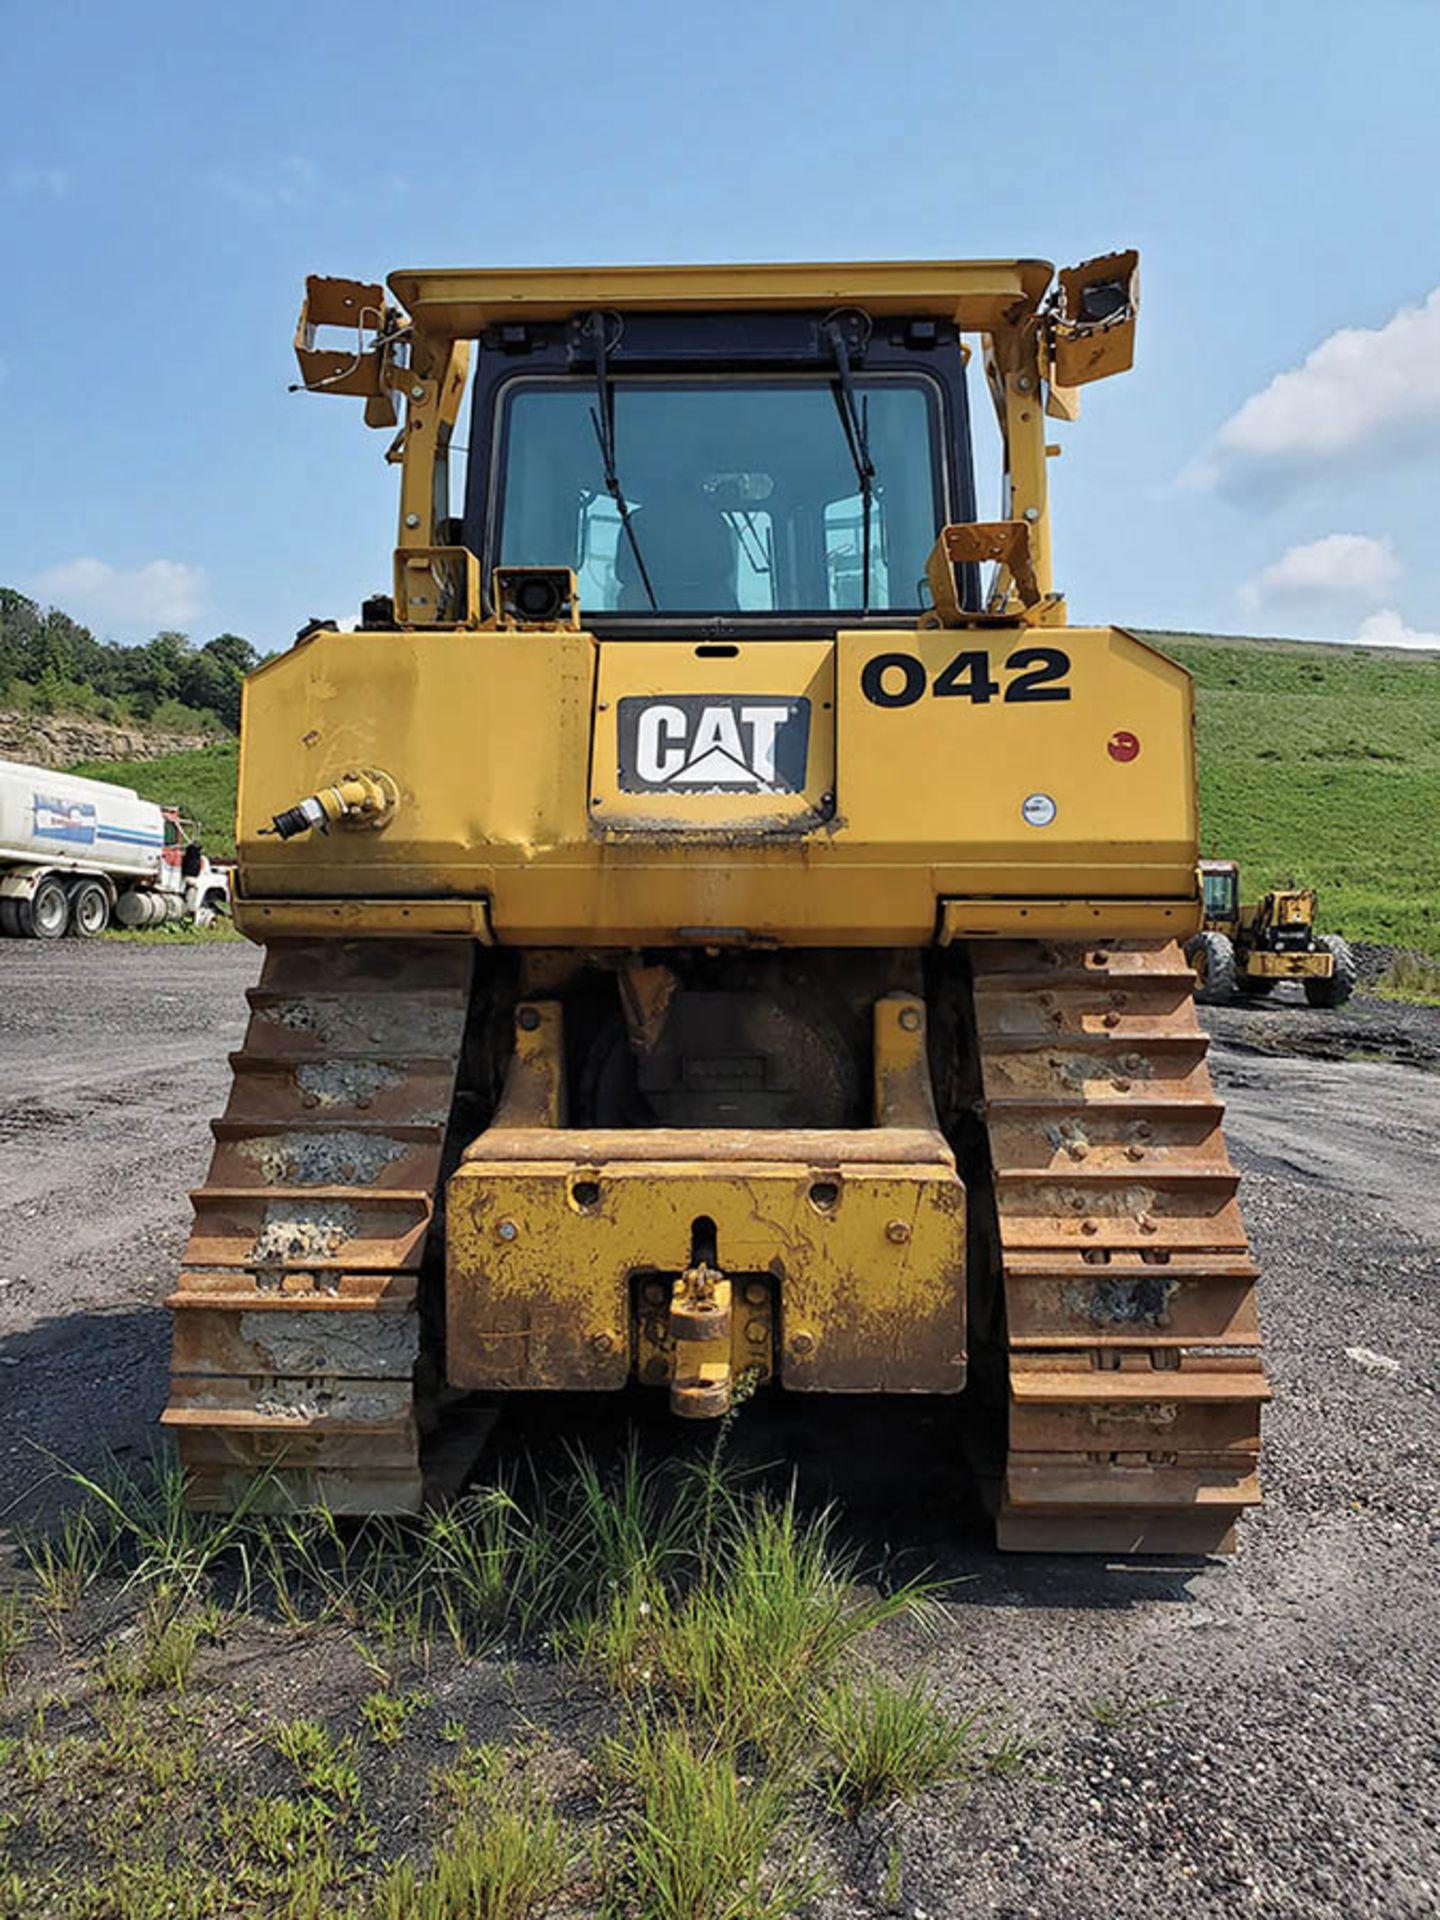 Lot 124 - CATERPILLAR D8T DOZER, S/N: KPZ02178, CAT C15 ENGINE, 24'' WIDE TRACKS, 166'' WIDE DOZER BLADE, REAR